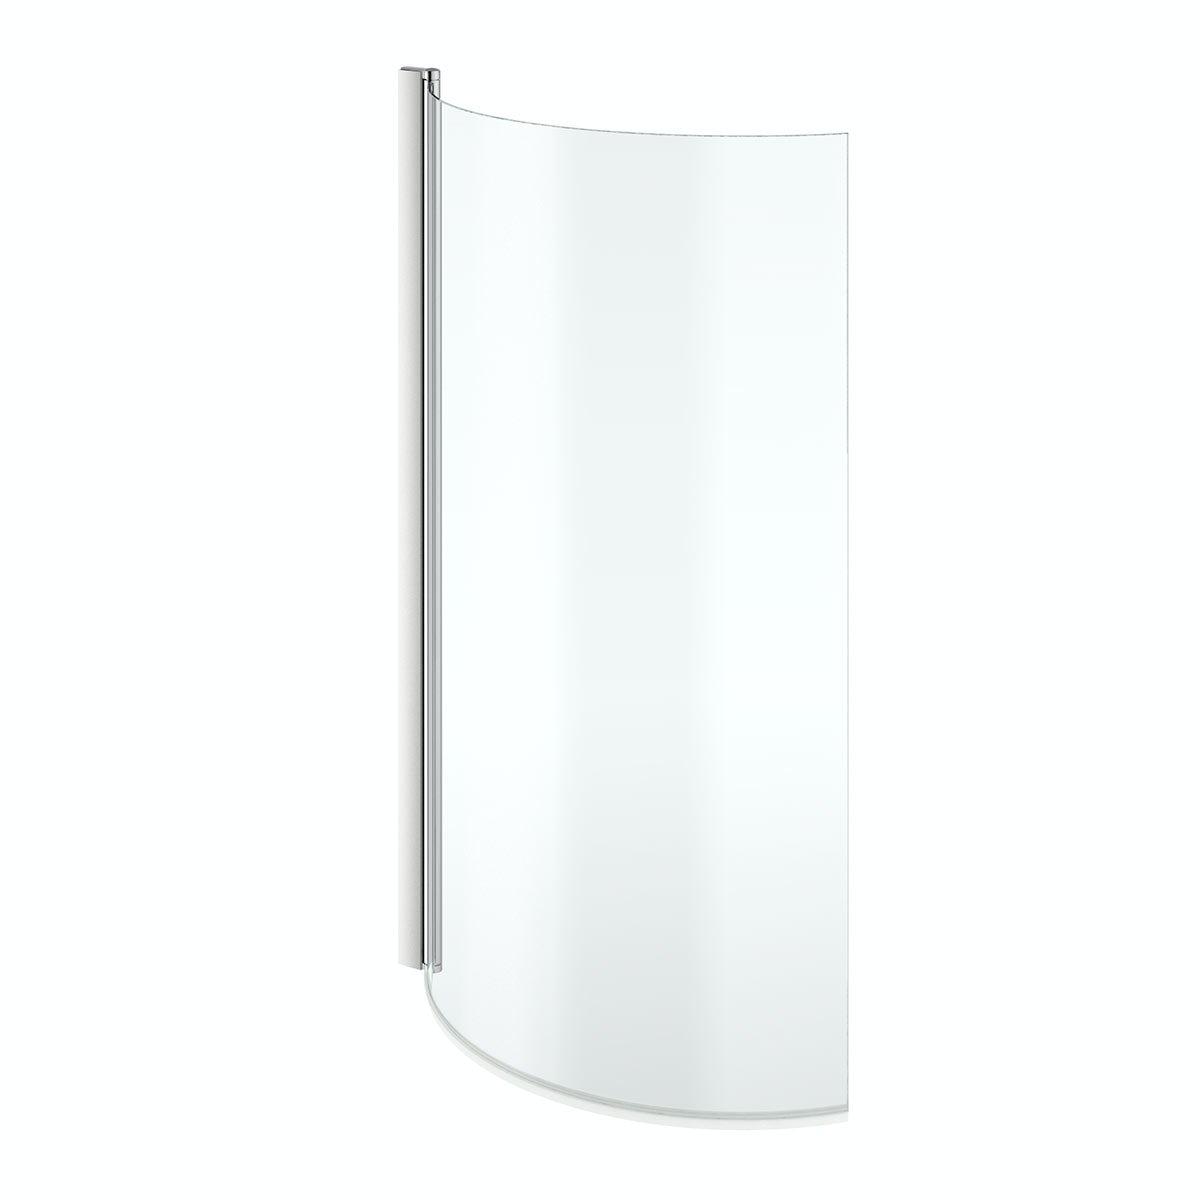 Shower Screen For P Shaped Bath Mode Maine Left Handed P Shaped Shower Bath And Shower